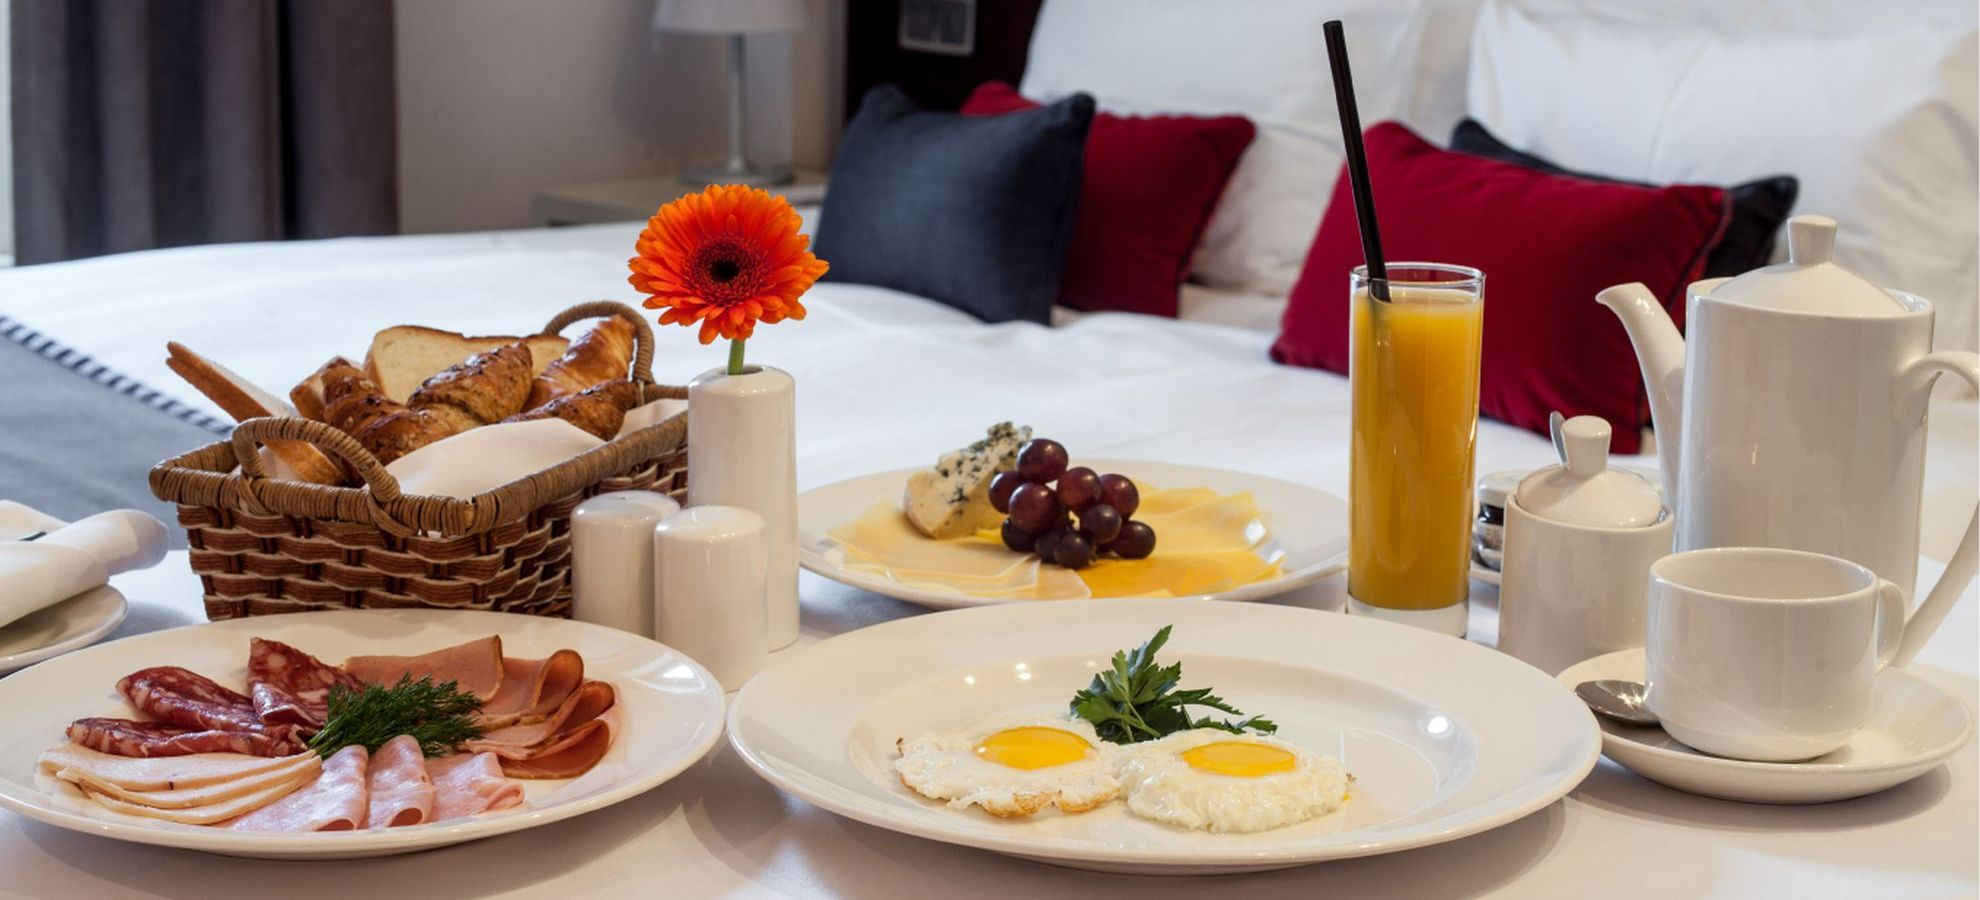 Mamaison-Hotel-Pokrovka-Junior-Suite-Breakfast.jpg